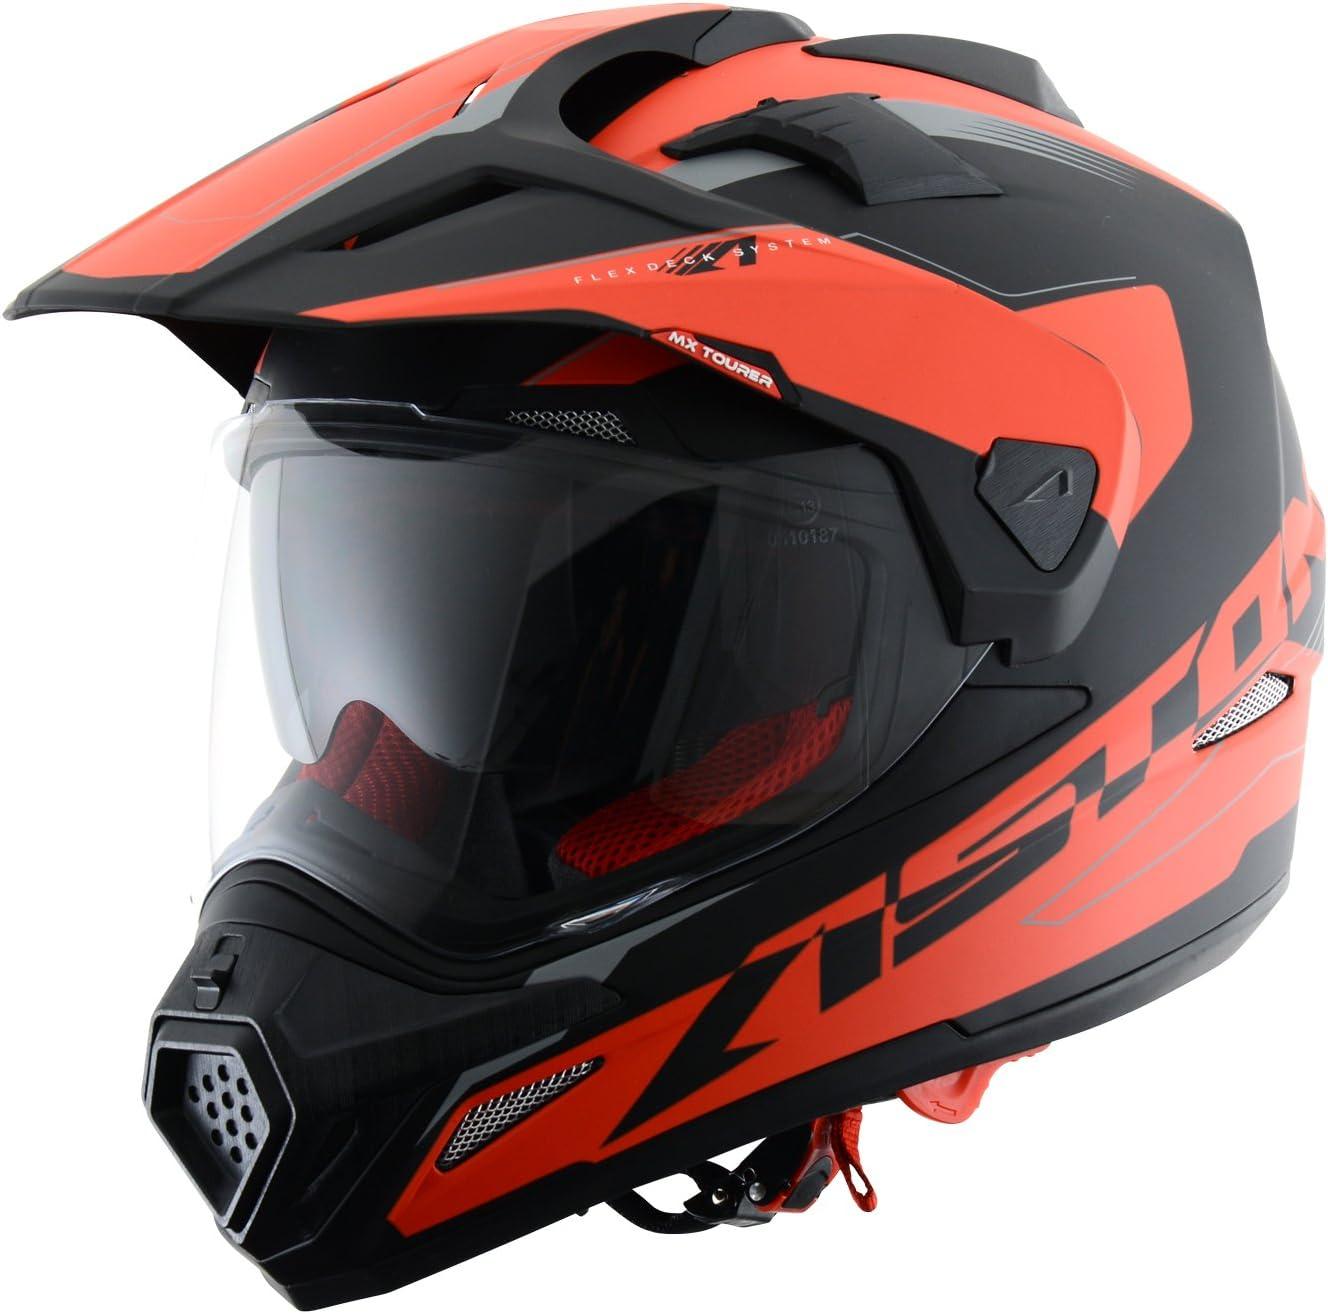 L Astone Helmets tourer-advbrl Kopfh/örer Tourer Adventure Wei/ß//Schwarz